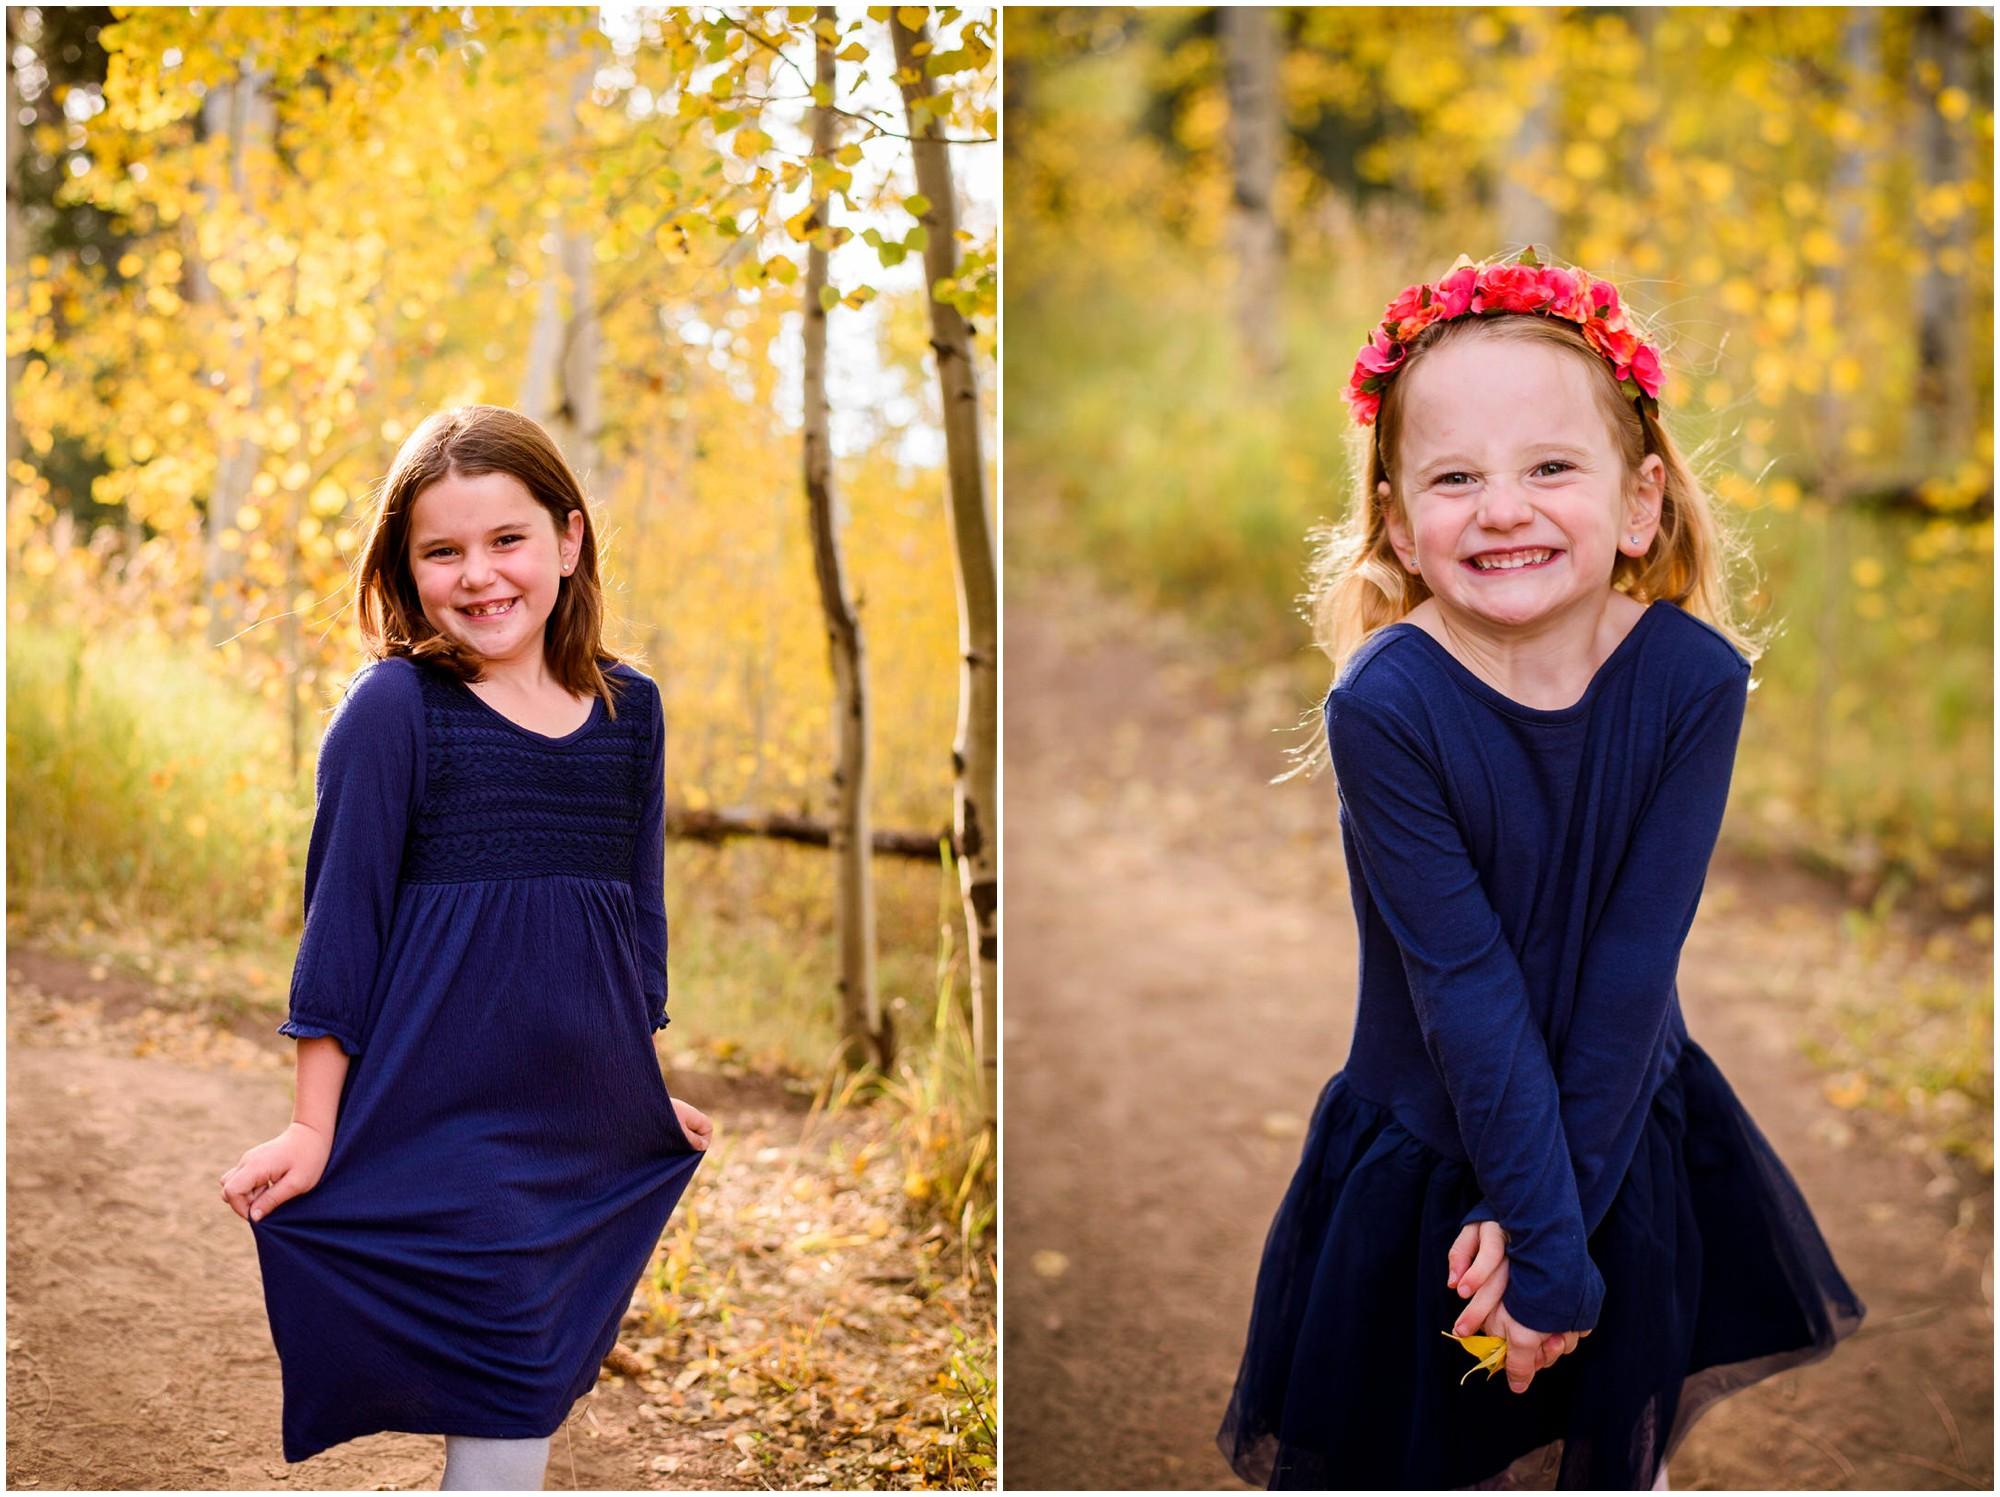 50-Meyer-ranch-fall-family-photography-reinstein.jpg